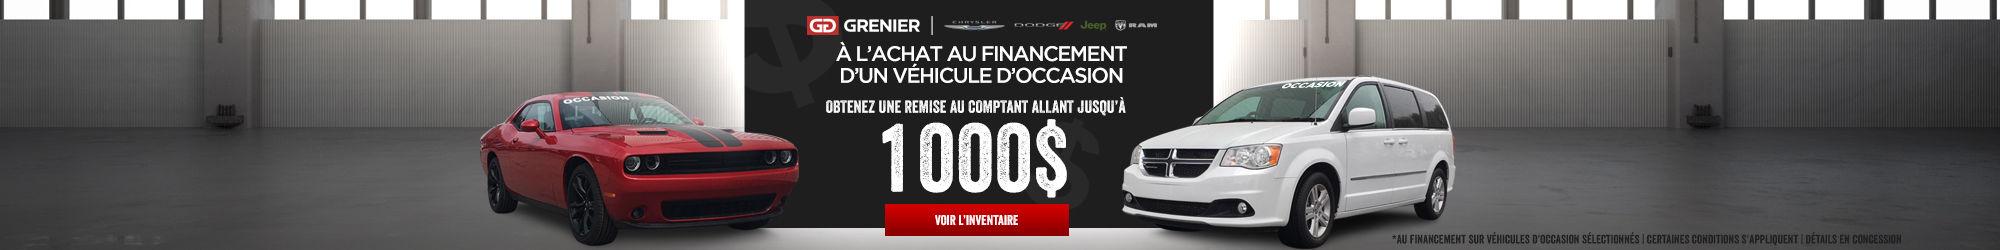 Remise comptant 1000$ véhicules d'occasion